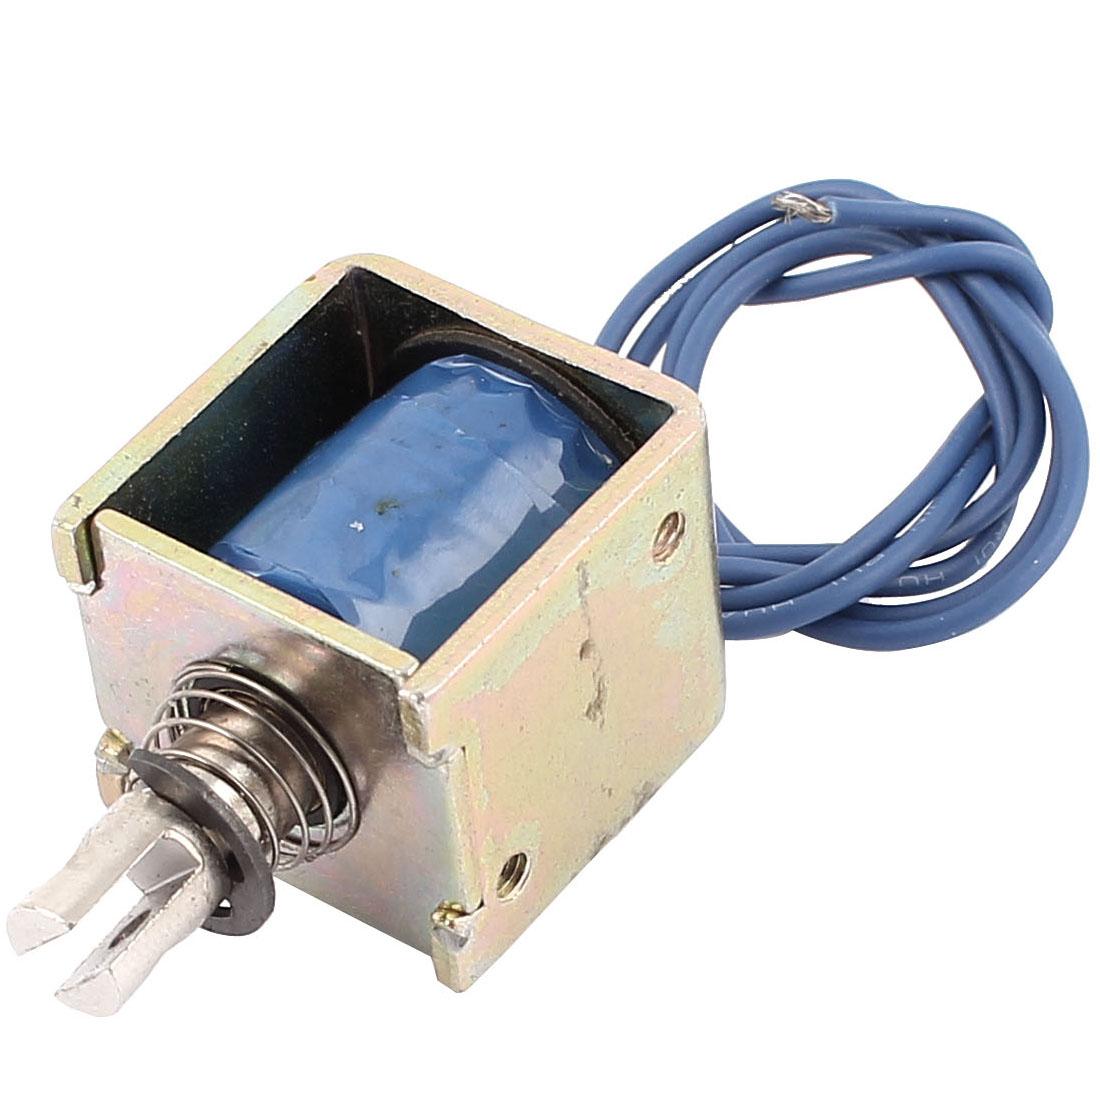 DC 12V 10mm Stroke Pull Type Open Frame Actuator Solenoid Electromagnet 15N